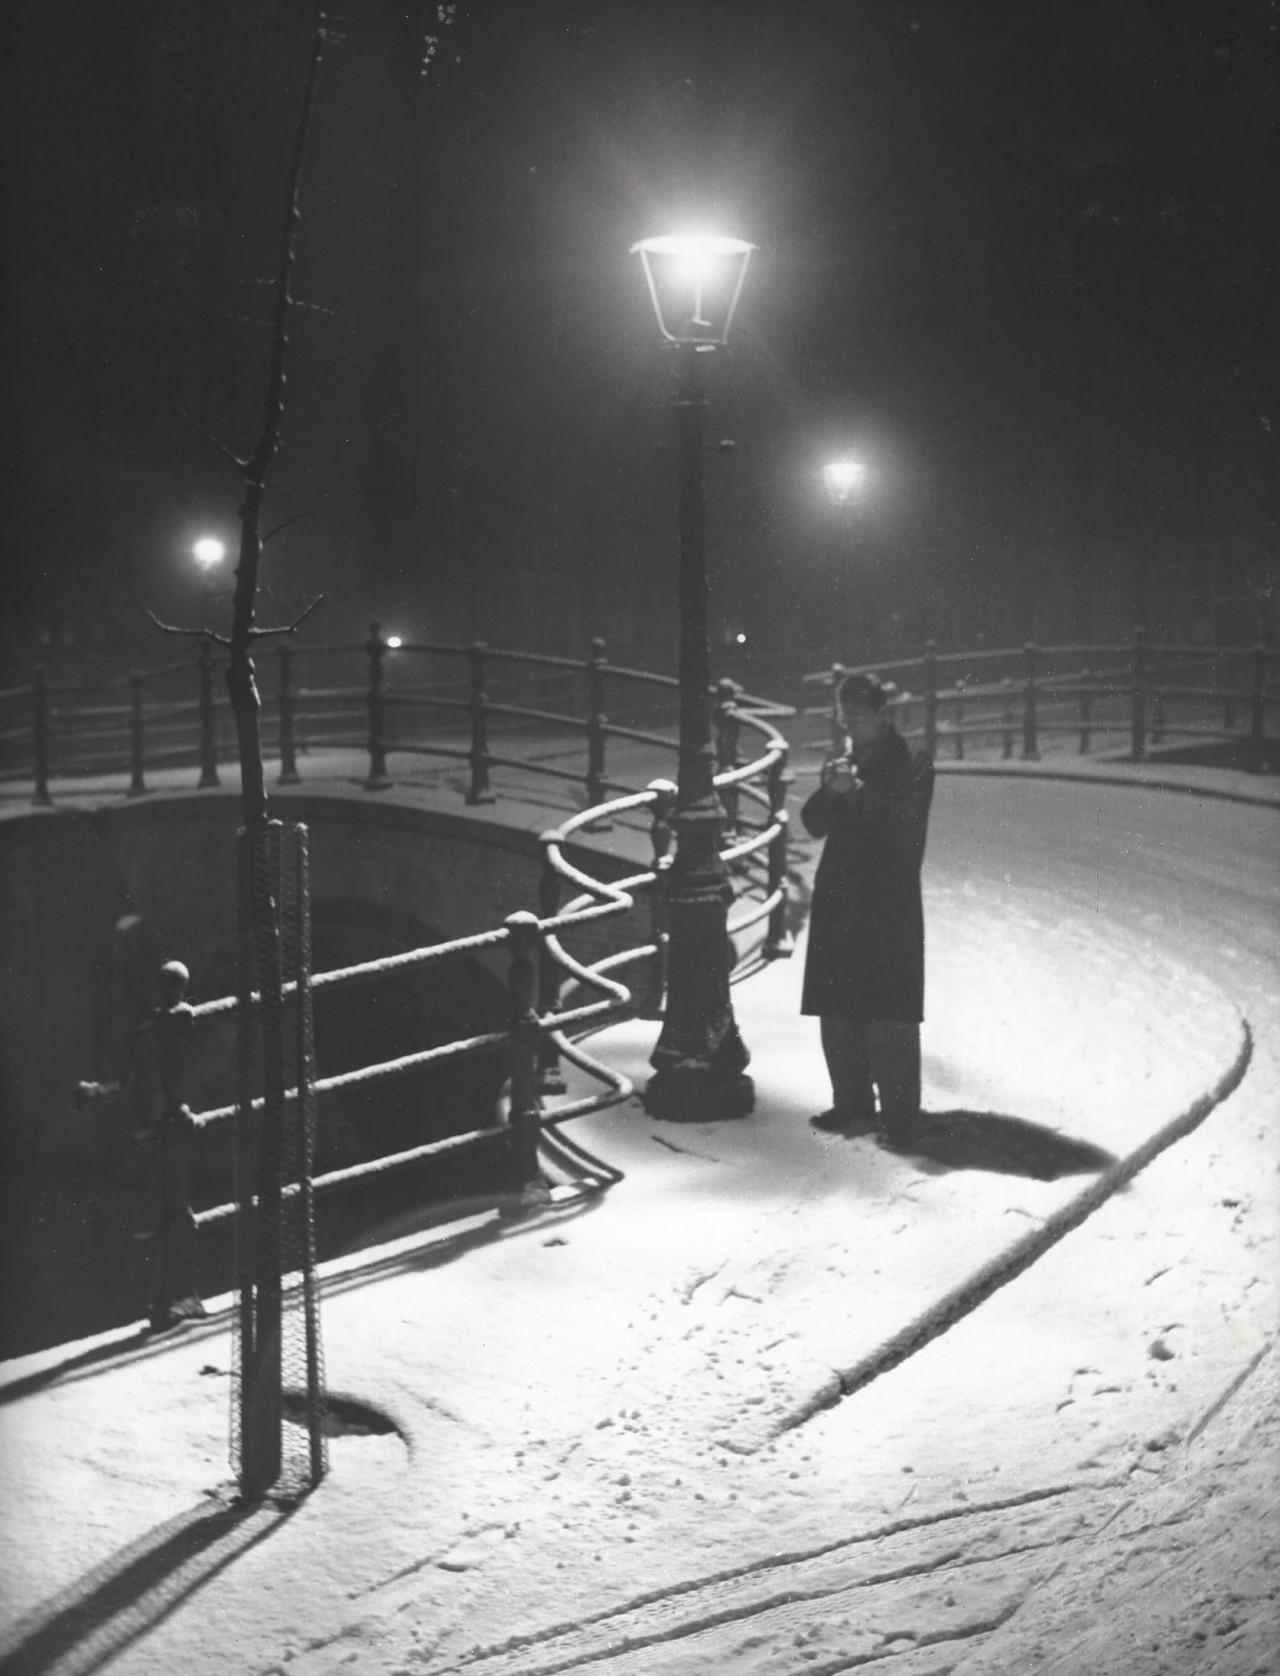 Человек под фонарём, Амстердам, 1950-е. Фотограф Кис Шерер